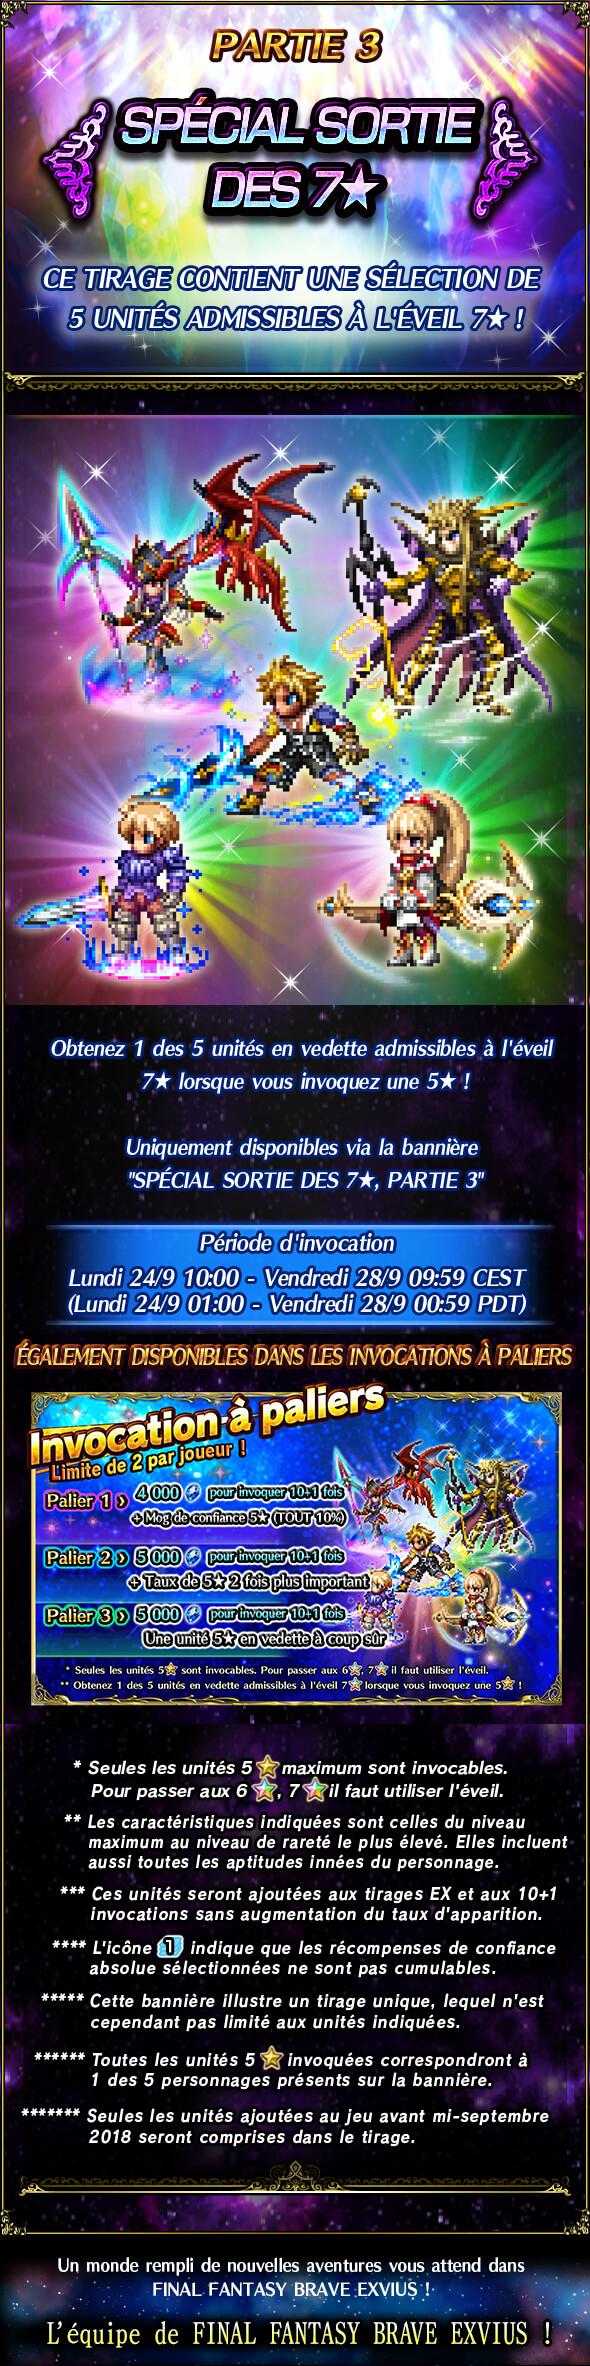 Invocations du moment - FFBE - Speciales sortie des 7* (lot 2) Gacha_7starfeaturepart3_Compilation